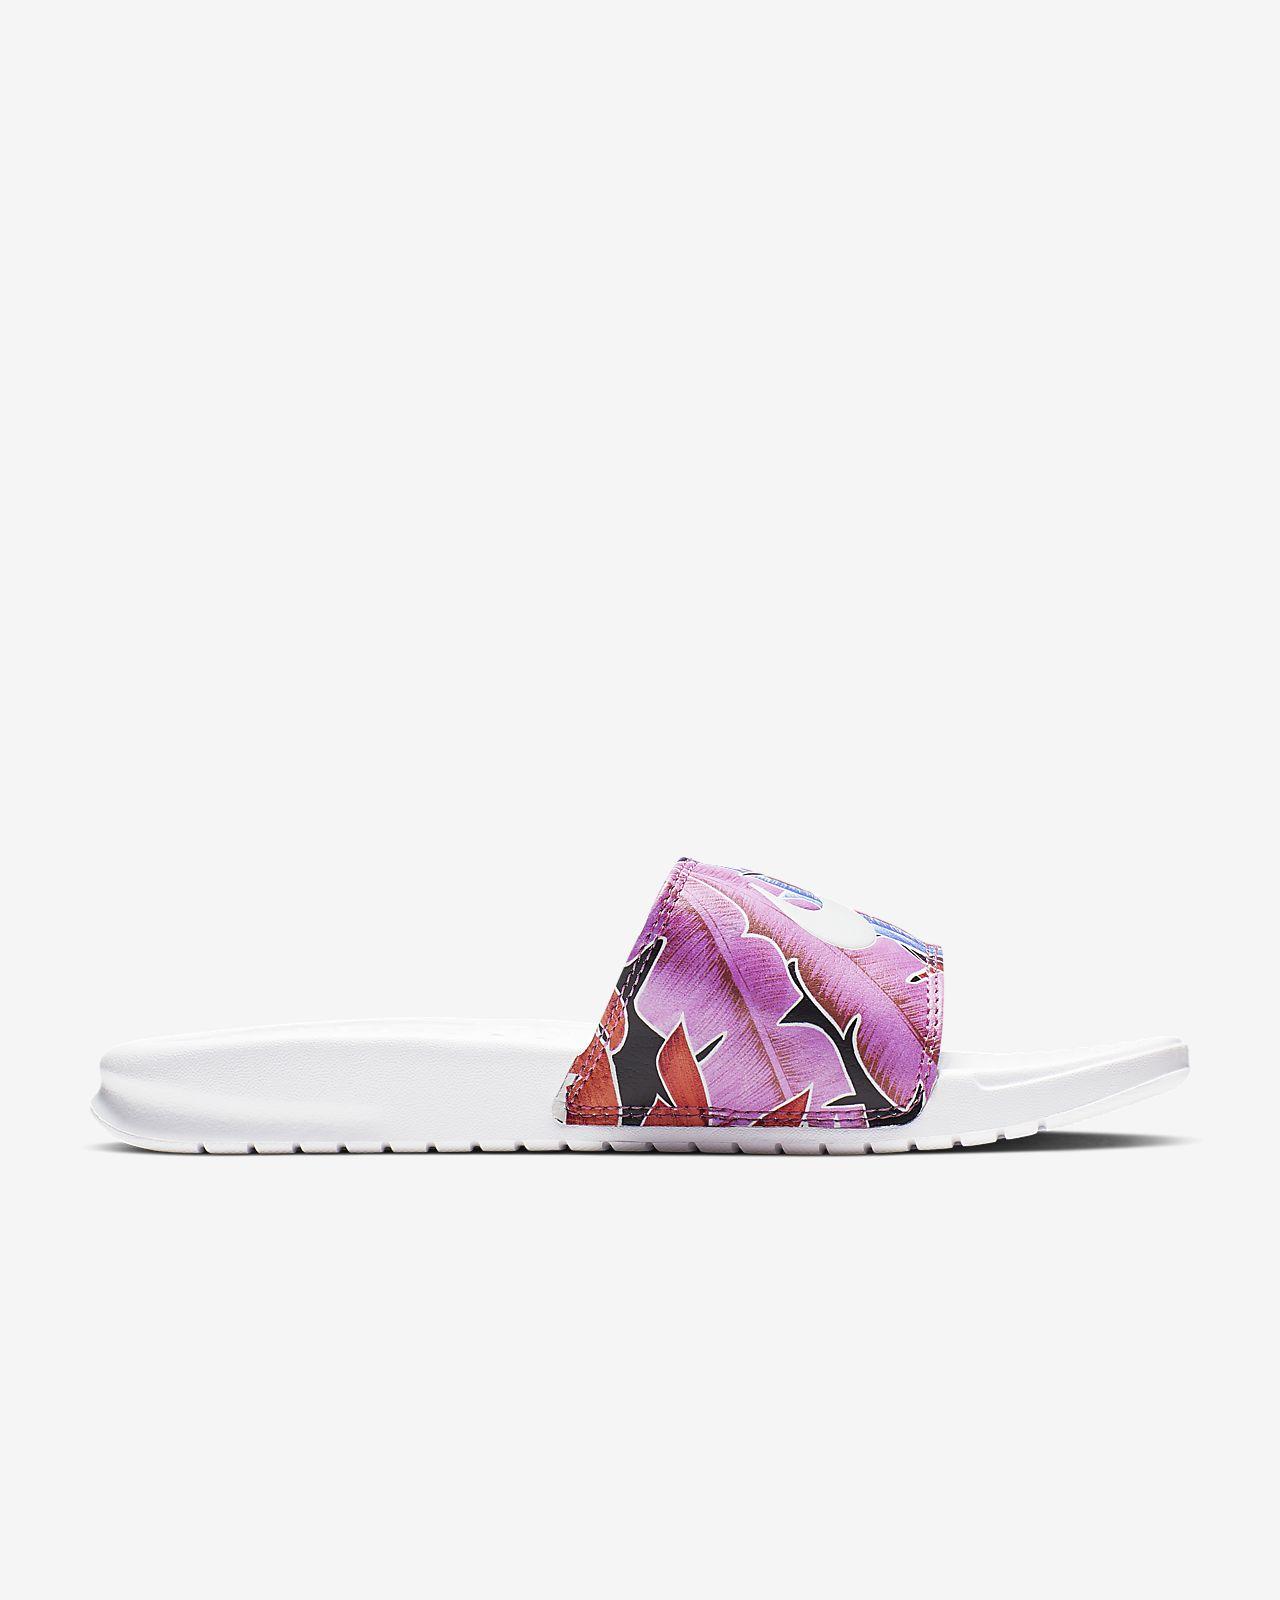 a6c5a1a9fb51 Nike Benassi JDI Floral Women s Slide. Nike.com AU